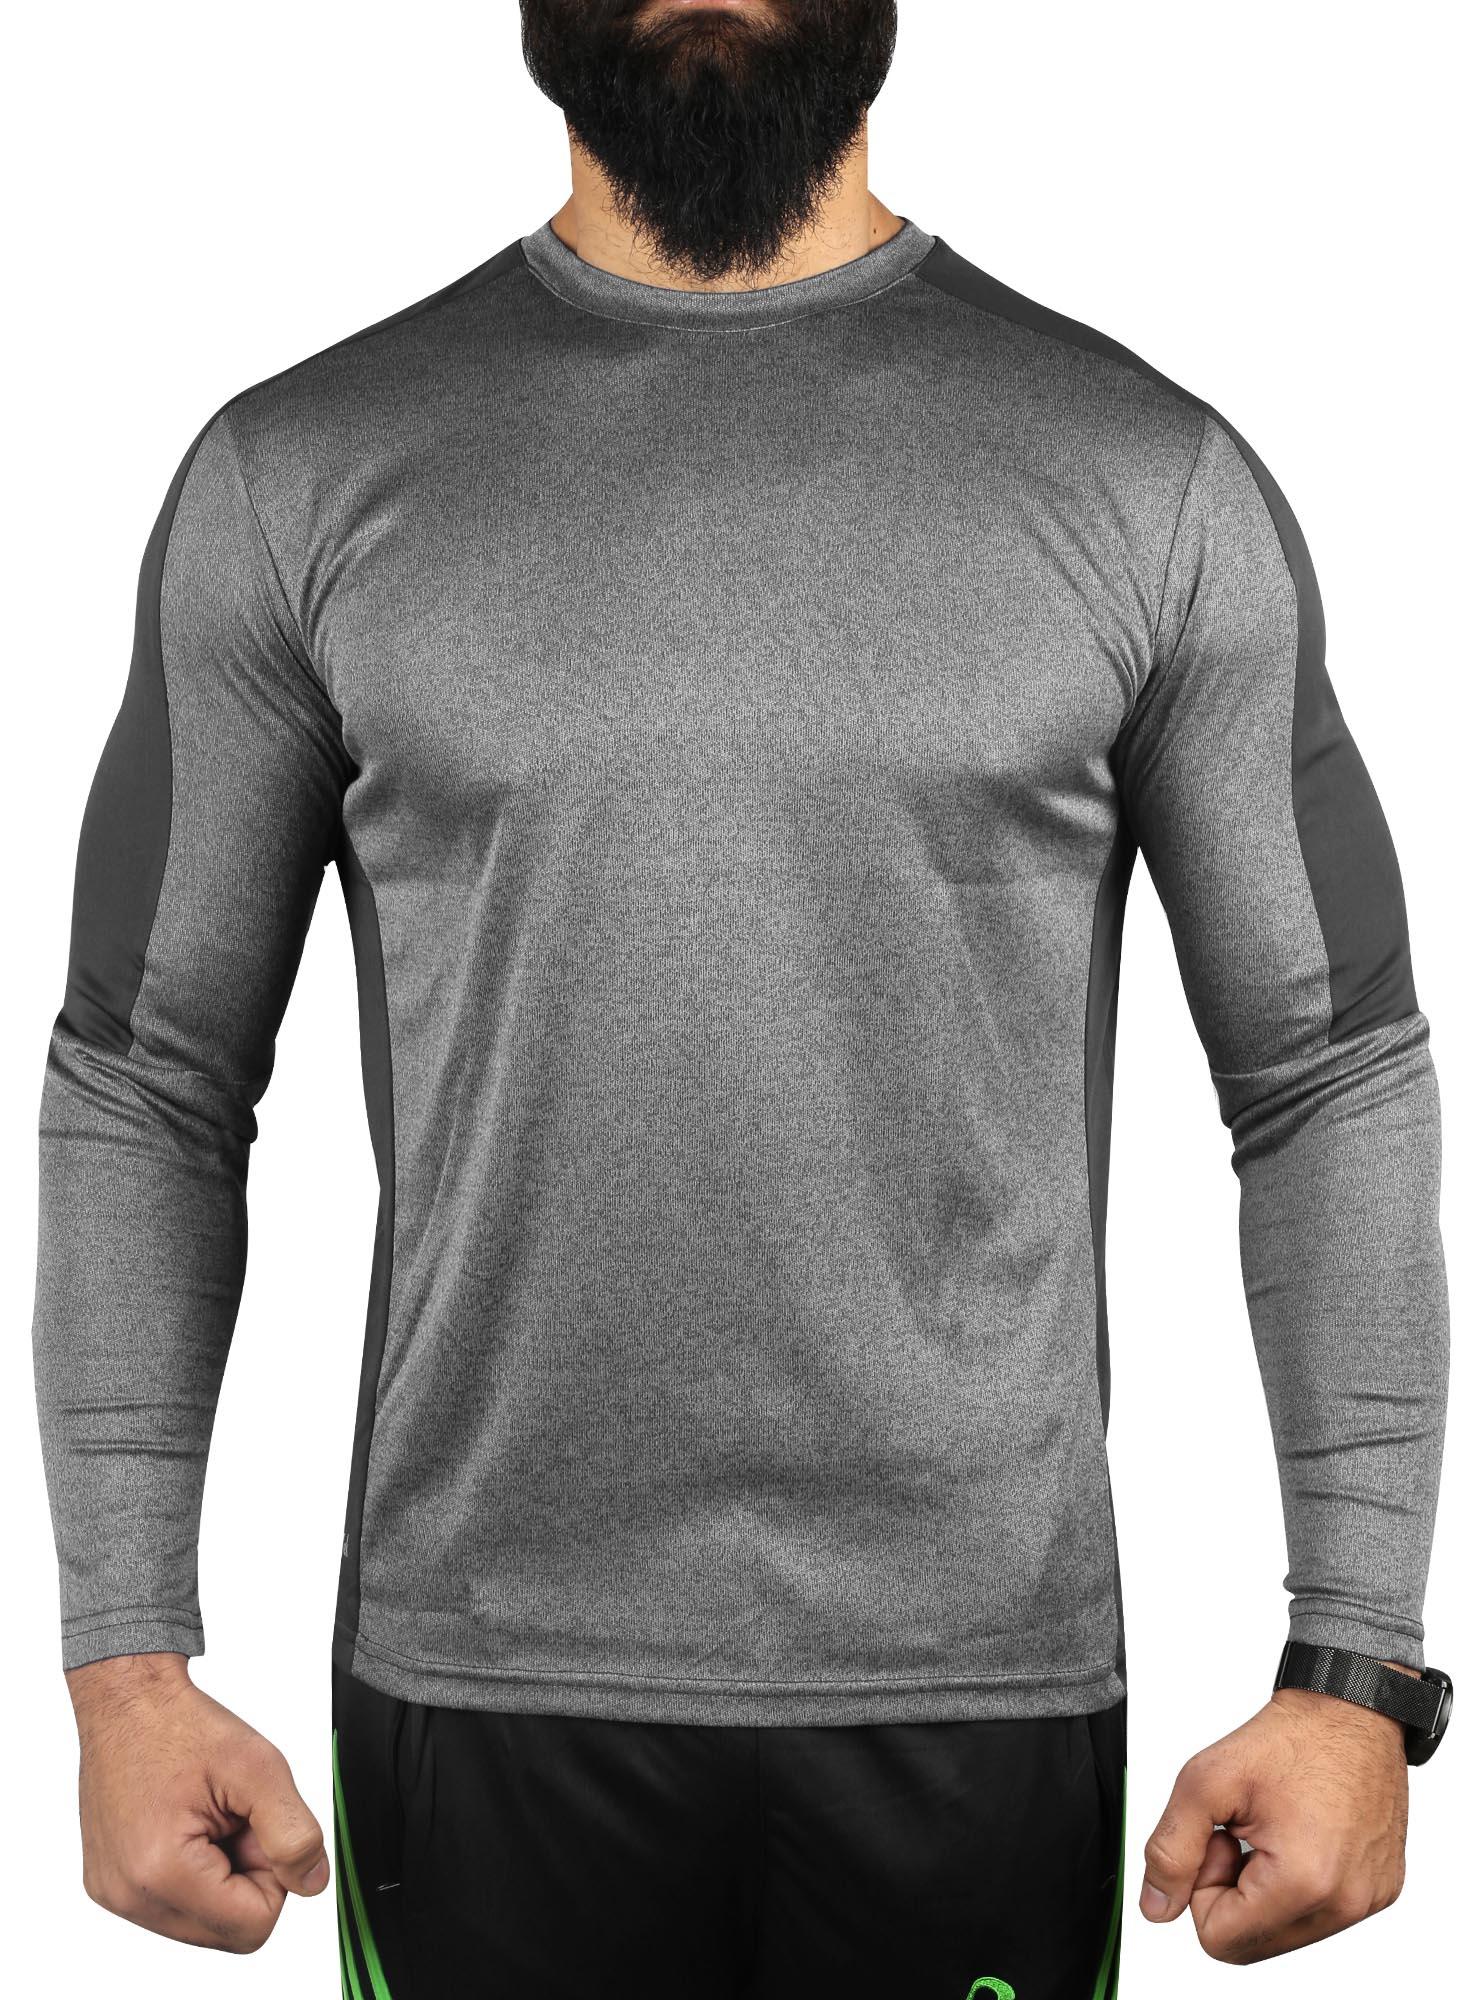 t shirts, sportswear